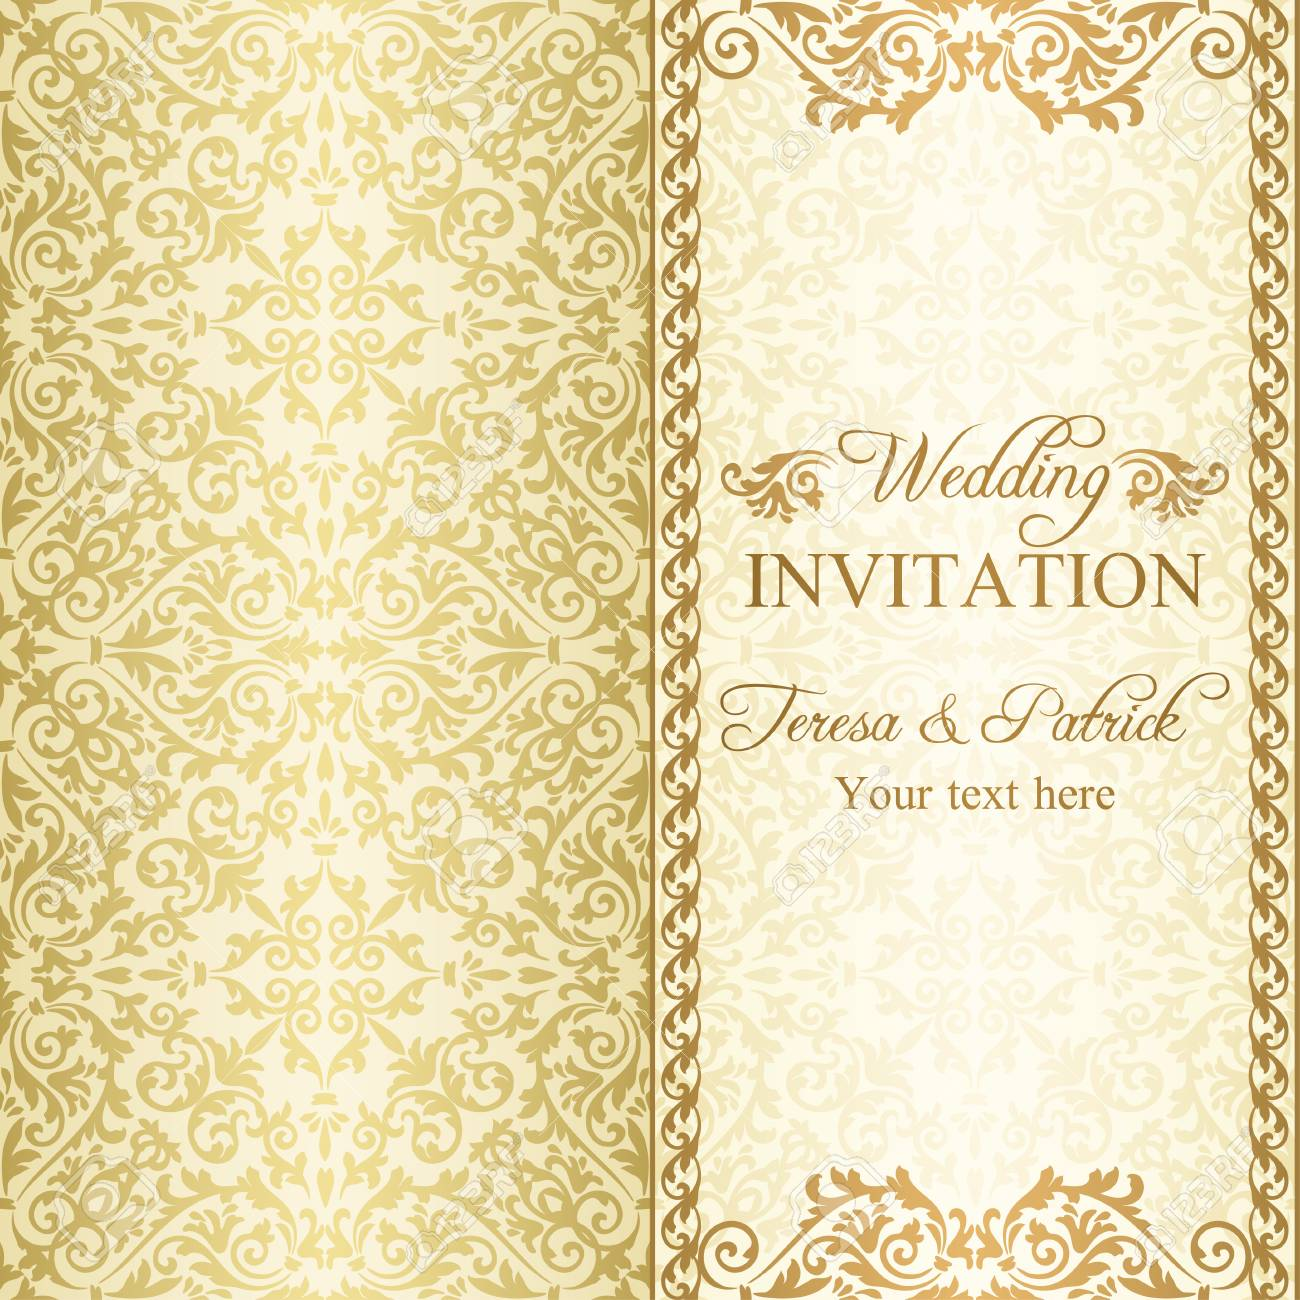 antique baroque wedding invitation gold on beige background royalty